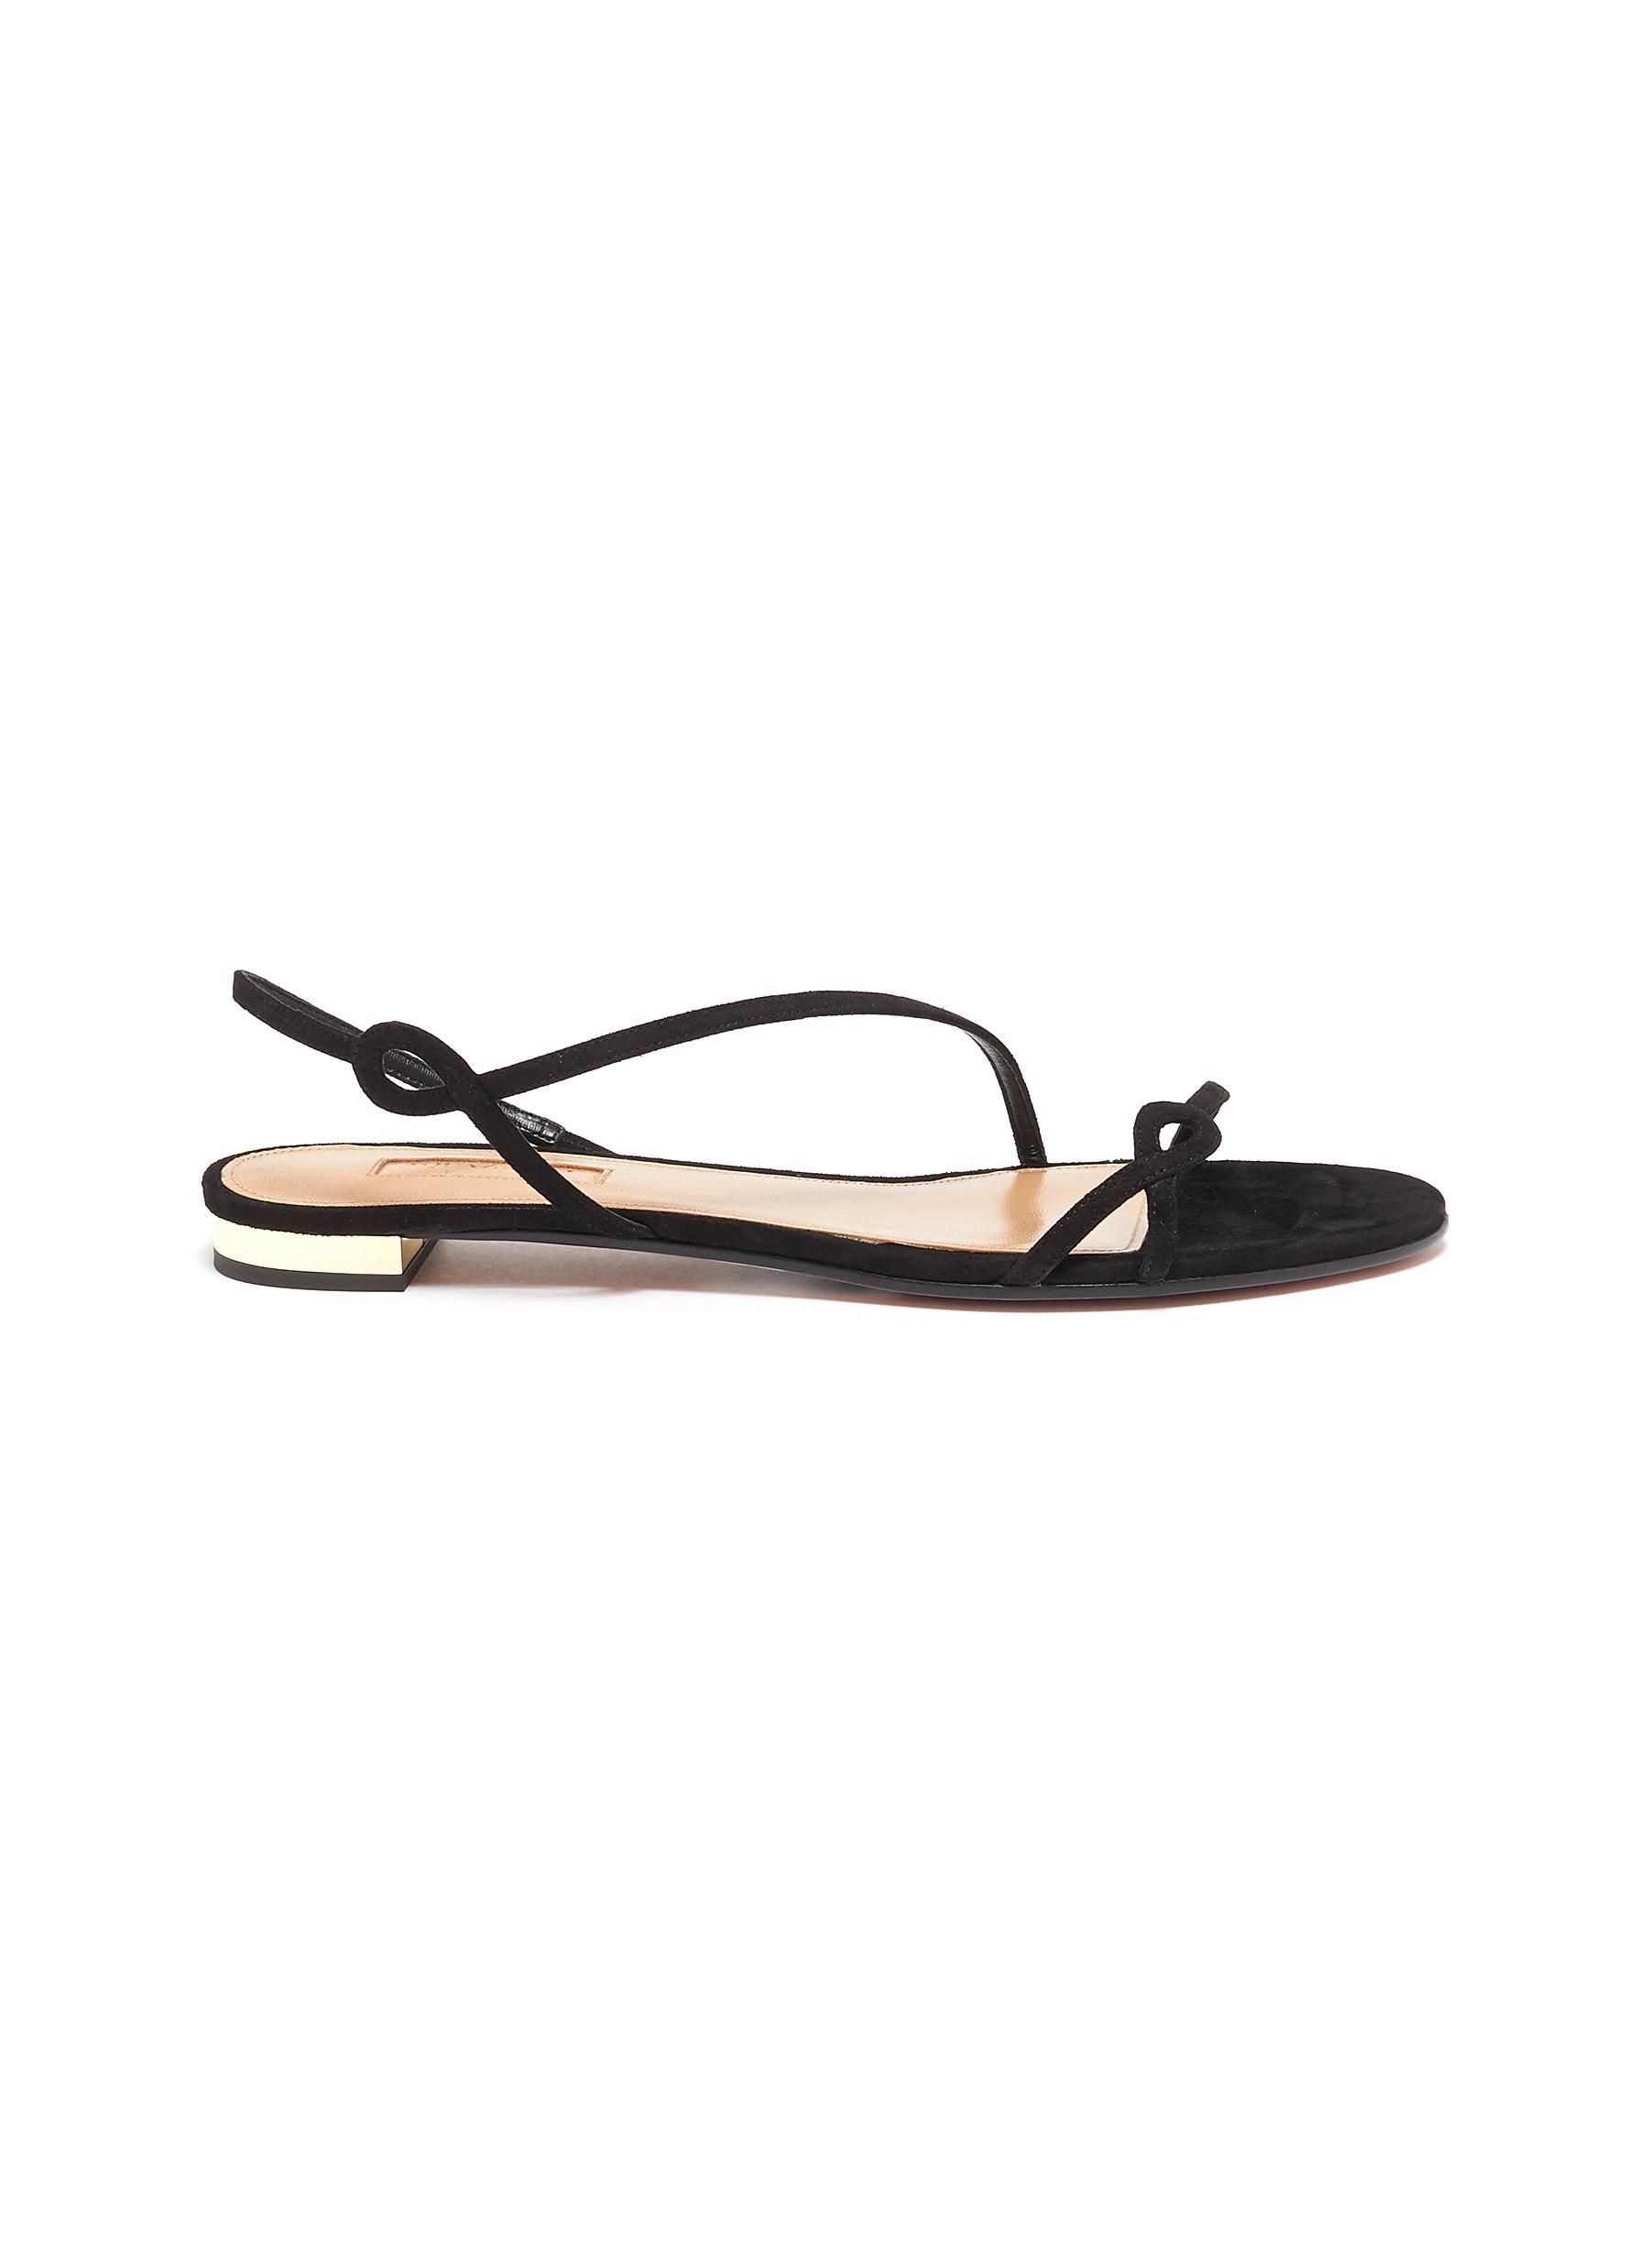 Aquazzura Flats Serpentine suede leather flat sandals